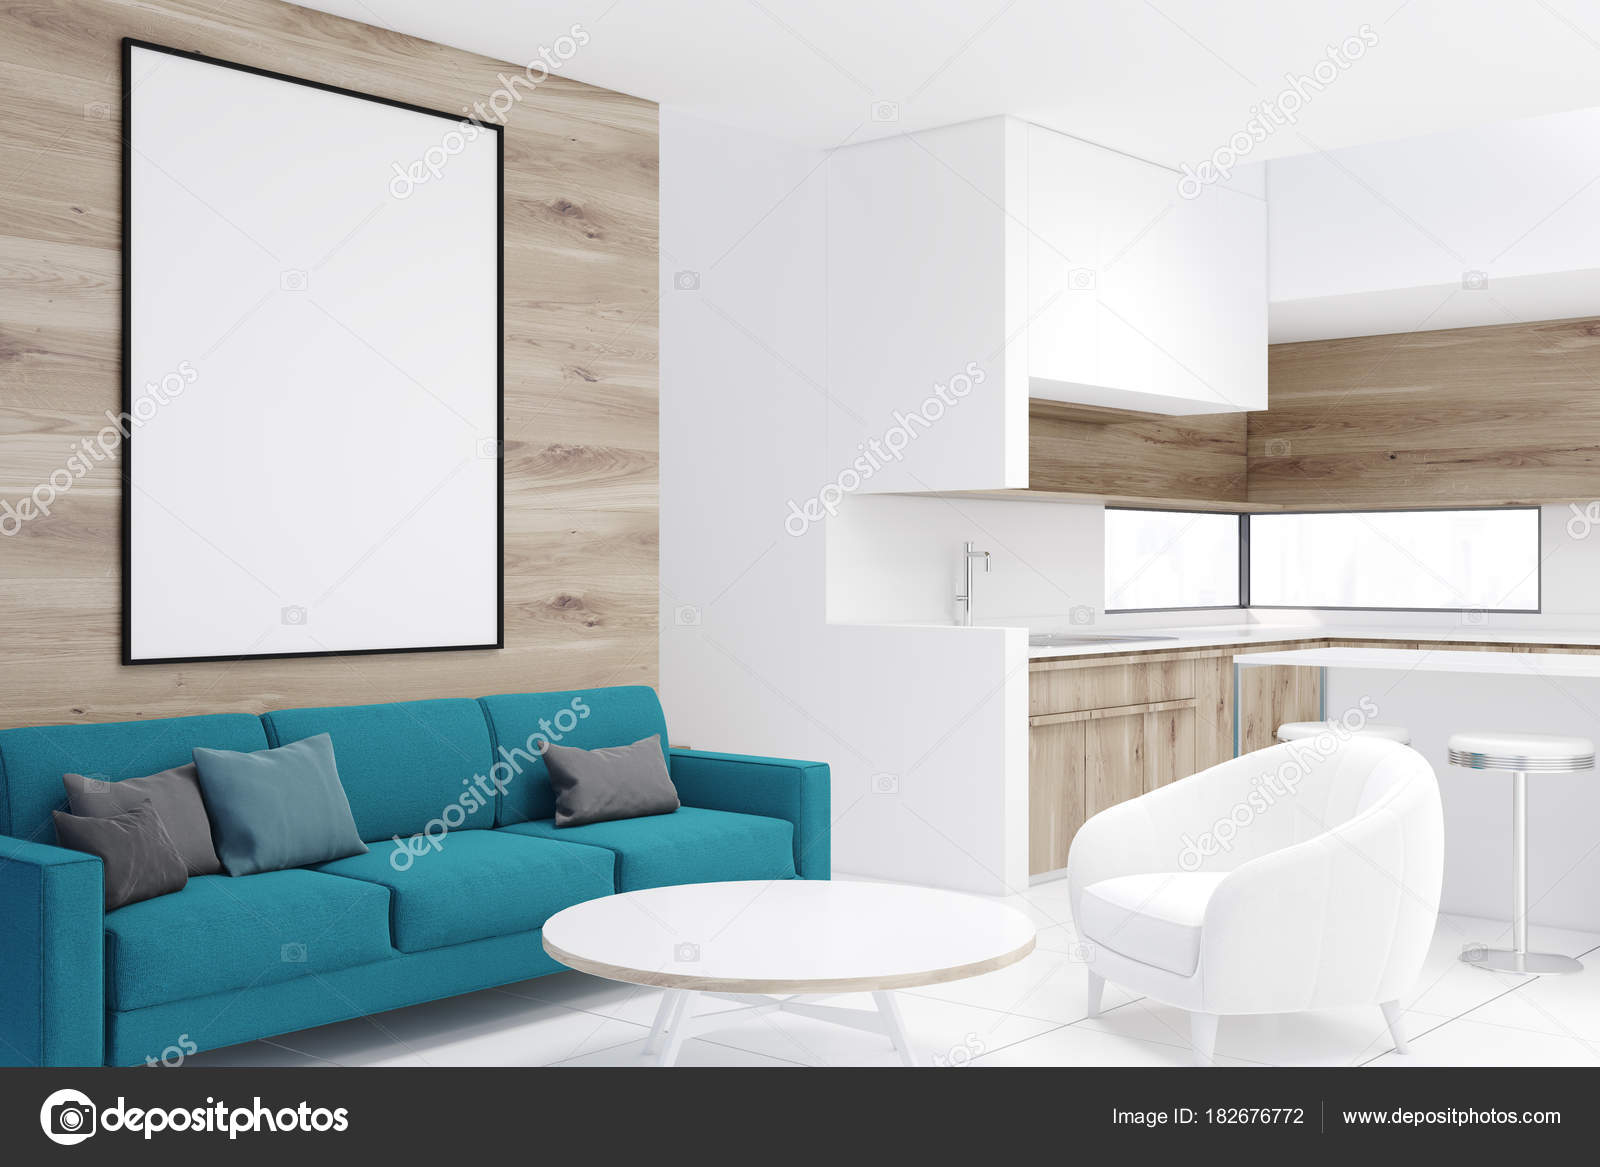 Esquina de madera sala de estar, sofá azul, cartel — Foto de stock ...